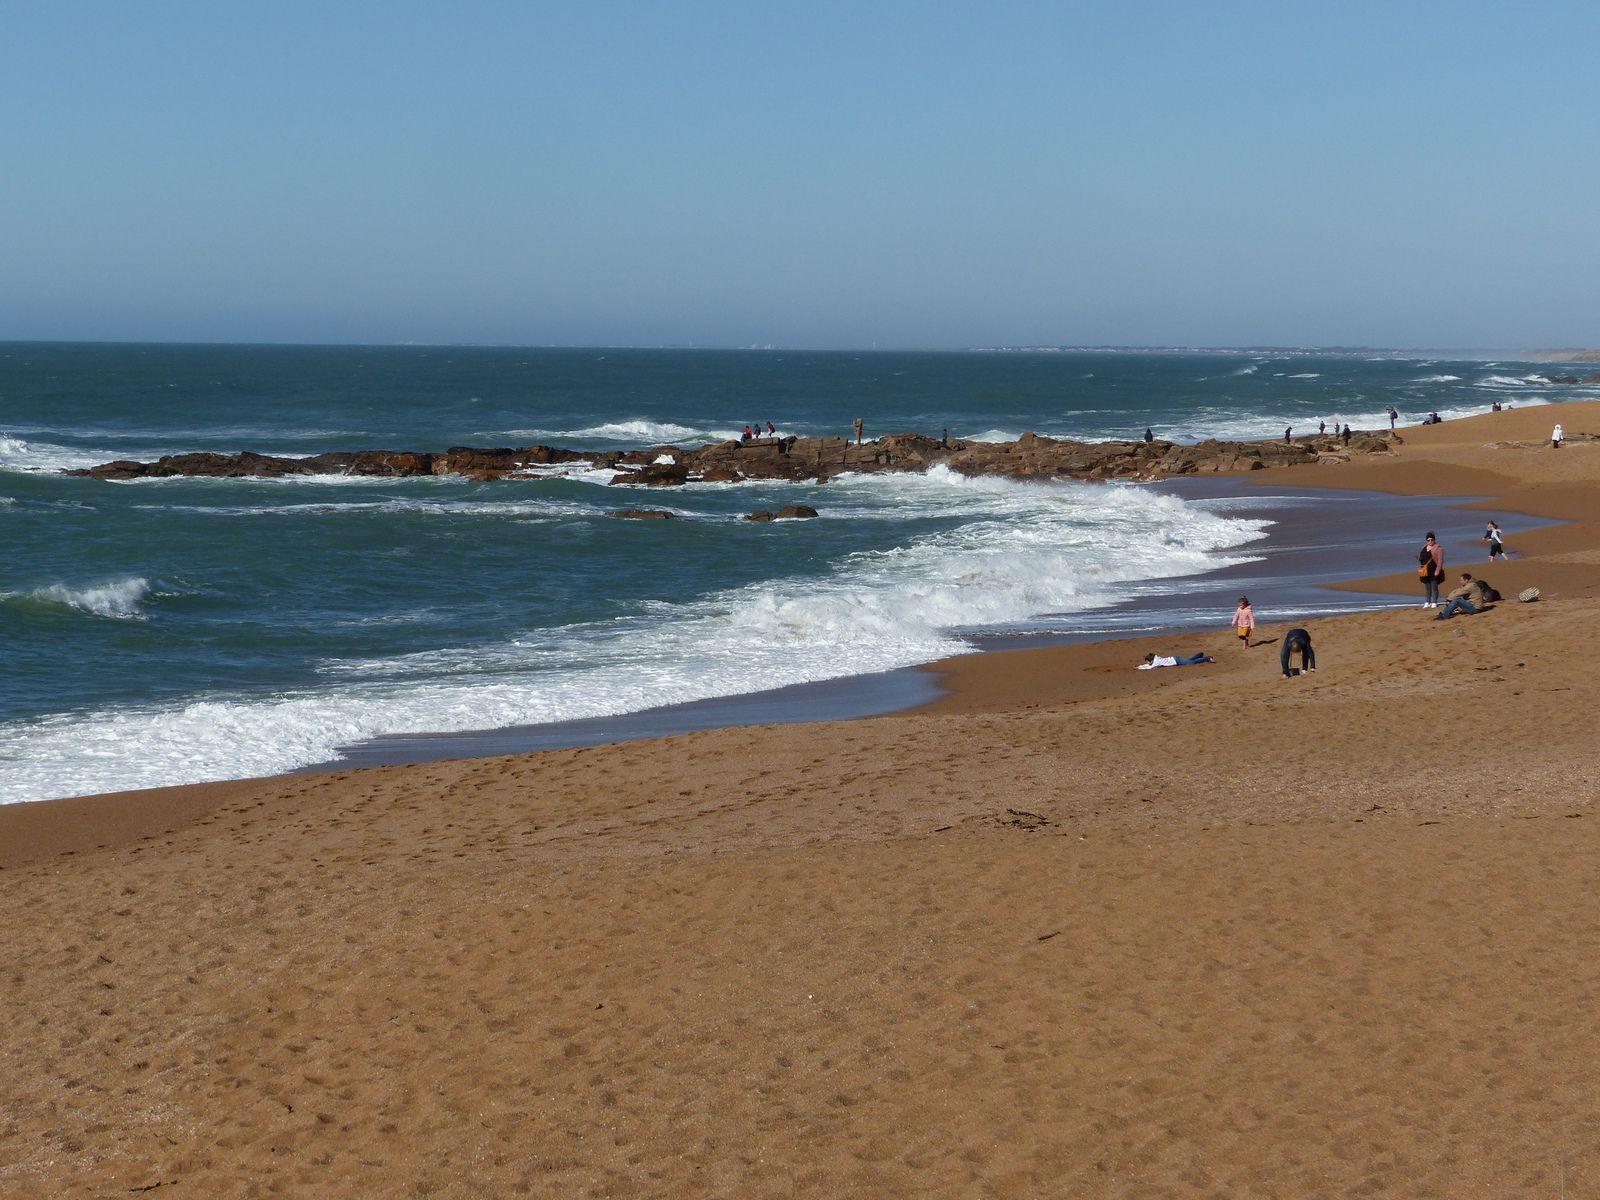 Promenade sur la plage de la Paracou